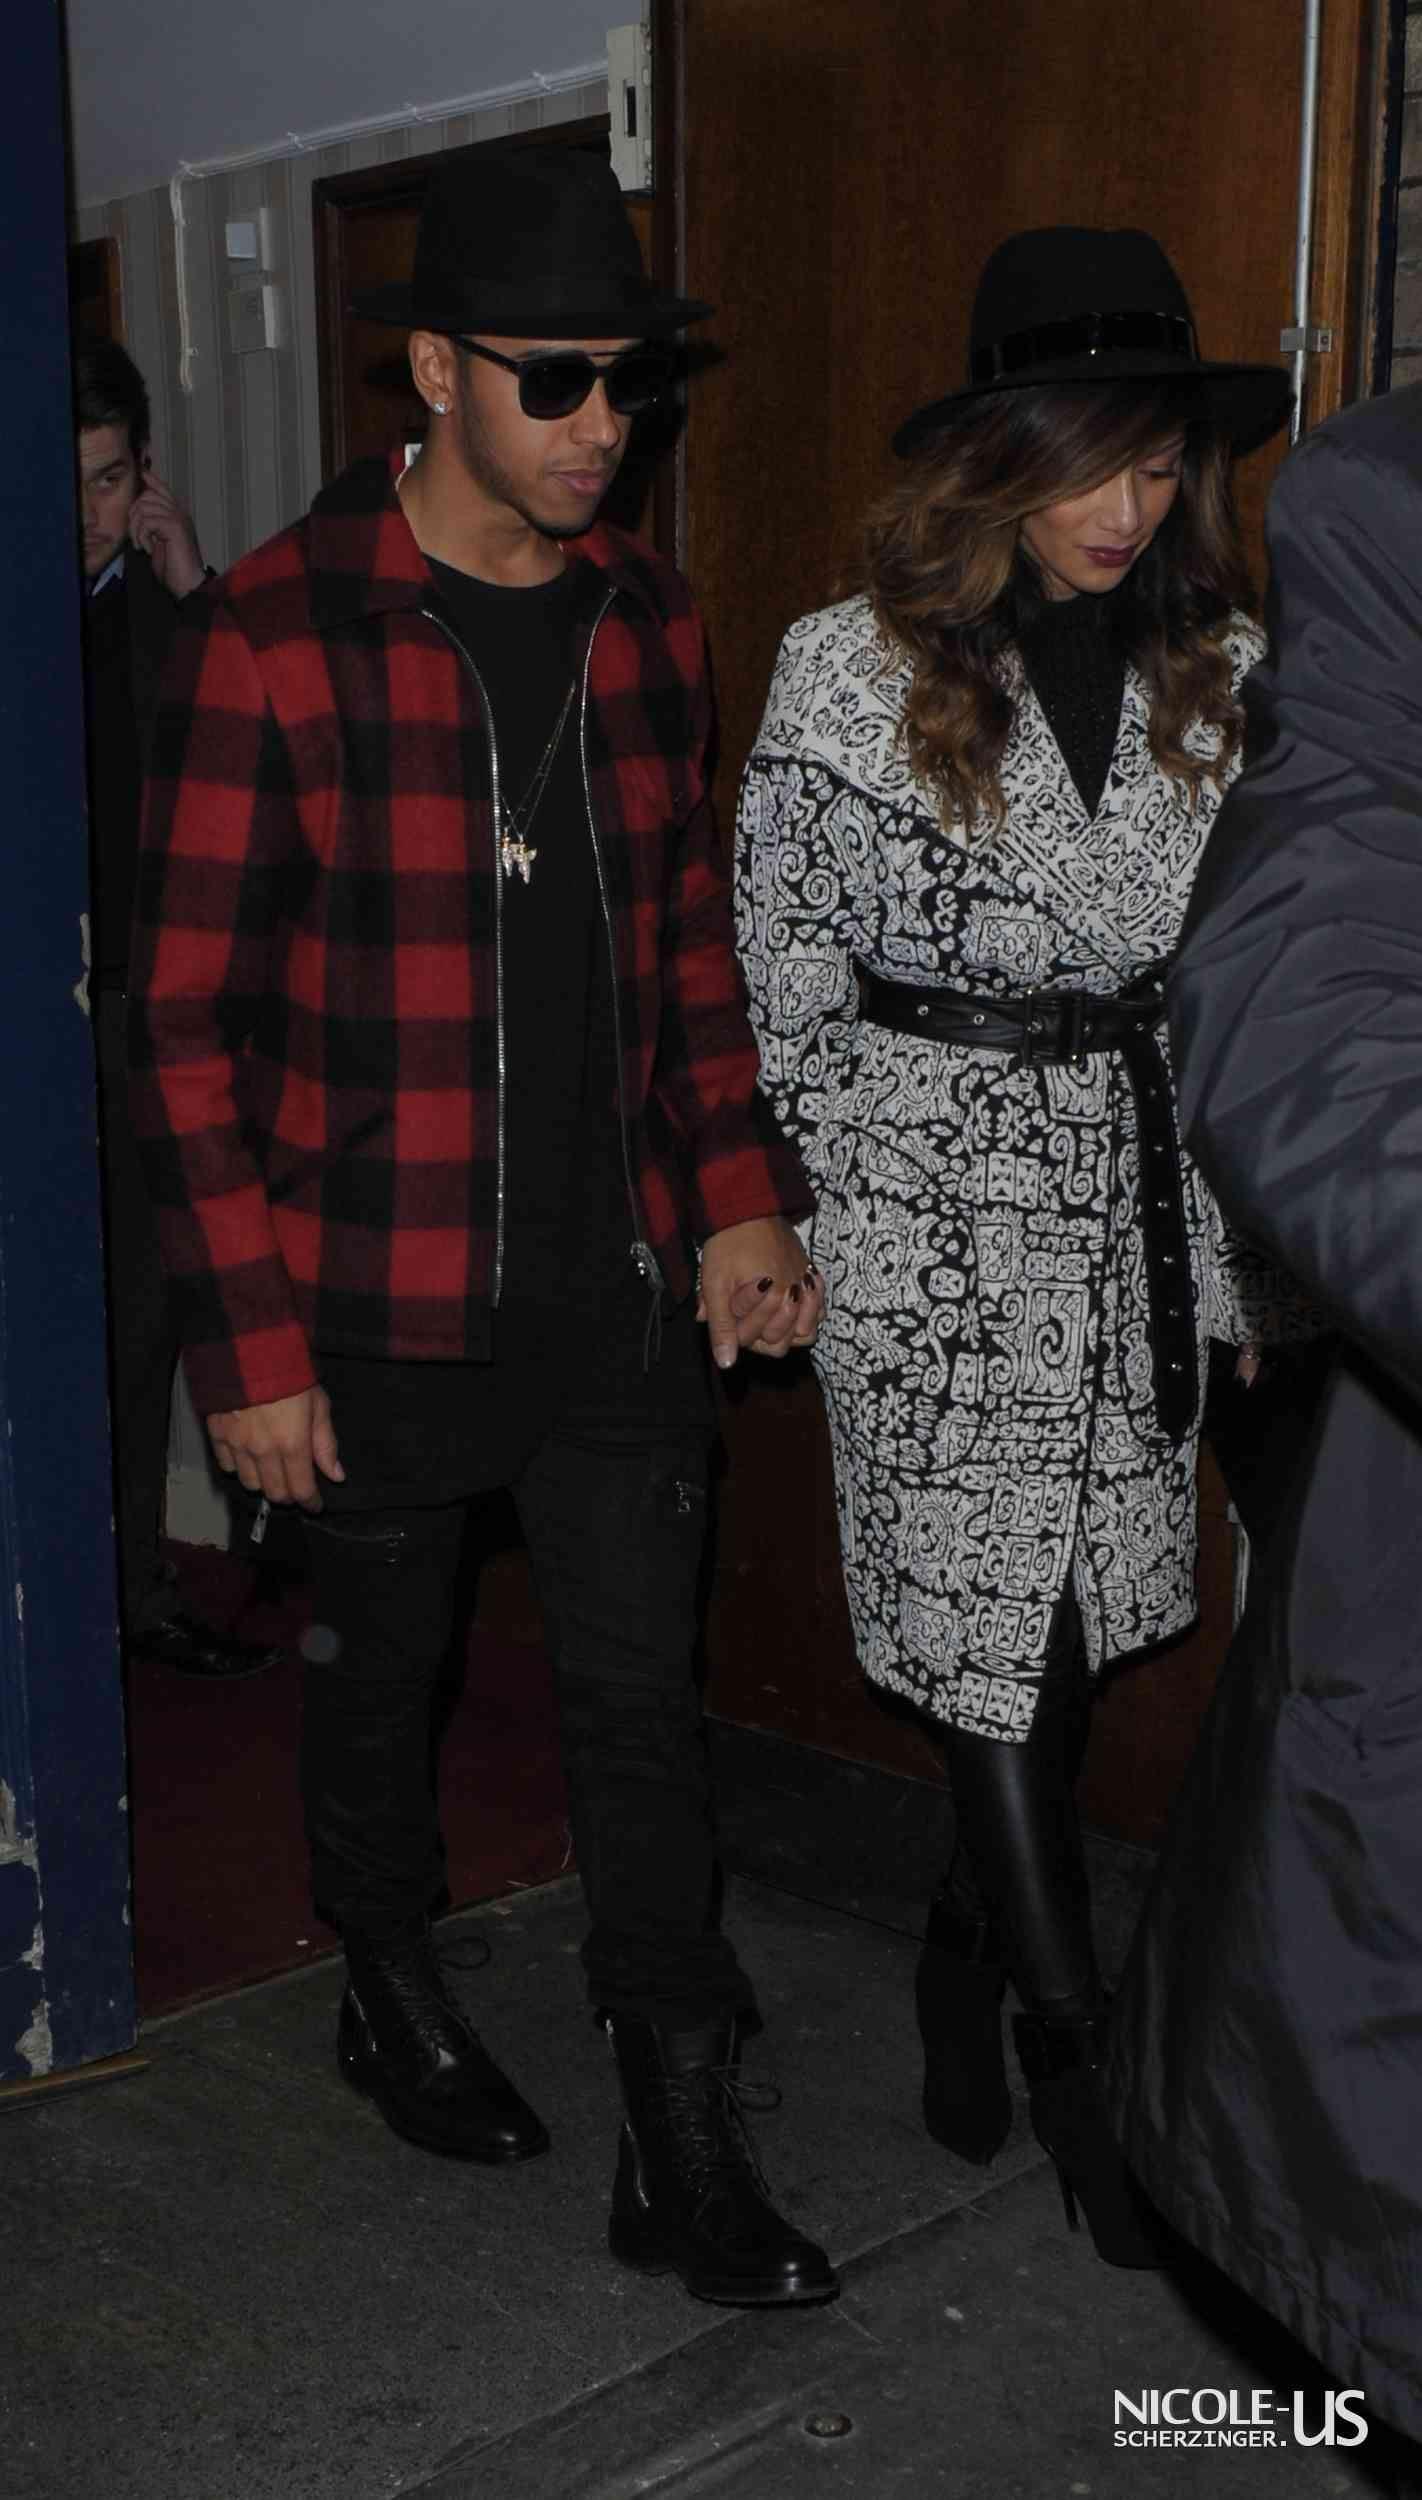 Nicole Scherzinger & Lewis Hamilton leaving the London Palladium Theatre